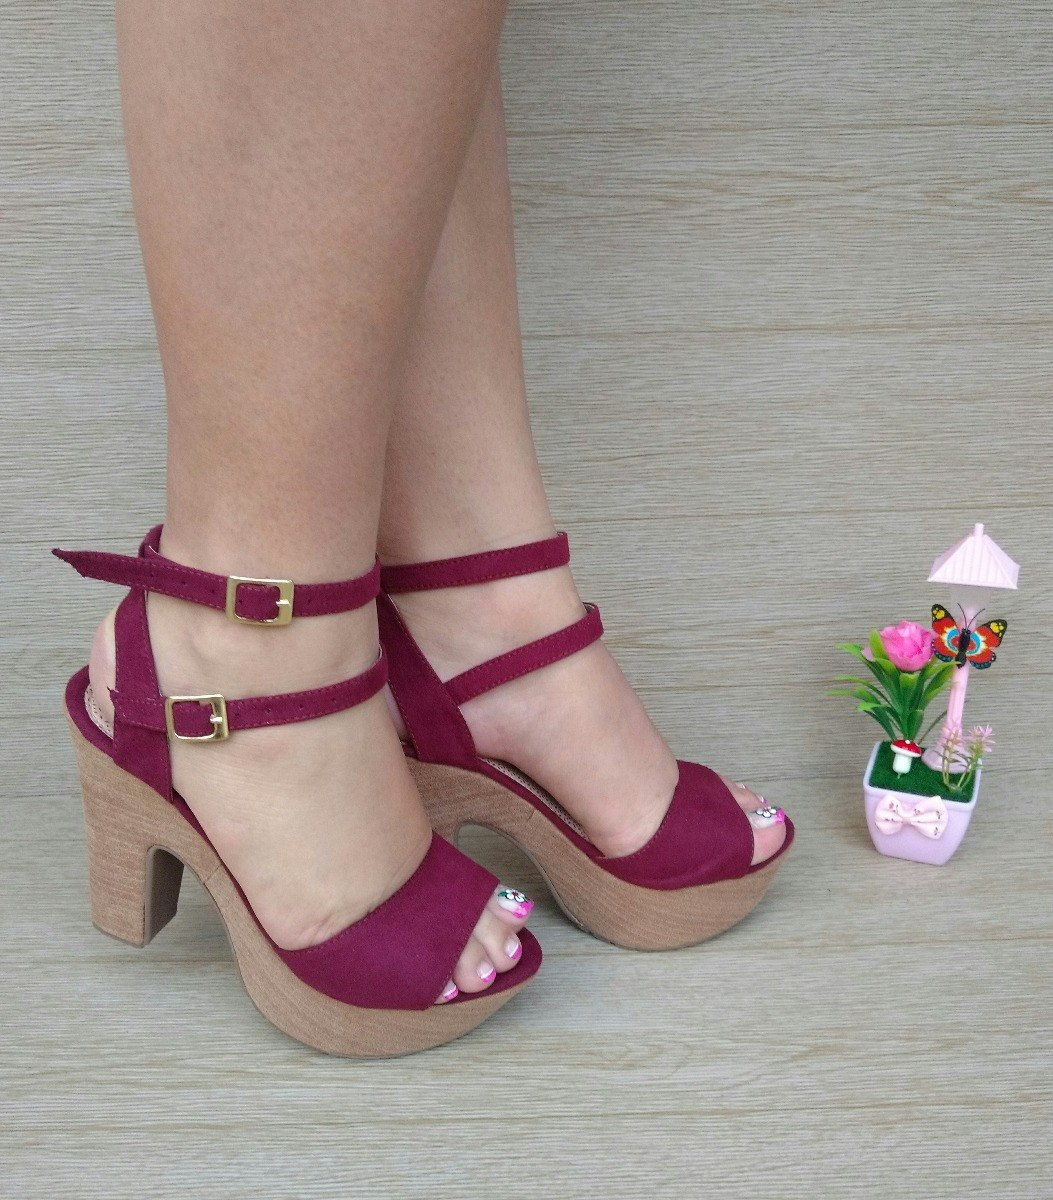 aa3818030 zapato plataforma tacón vinotinto de moda para mujer dama. Cargando zoom.